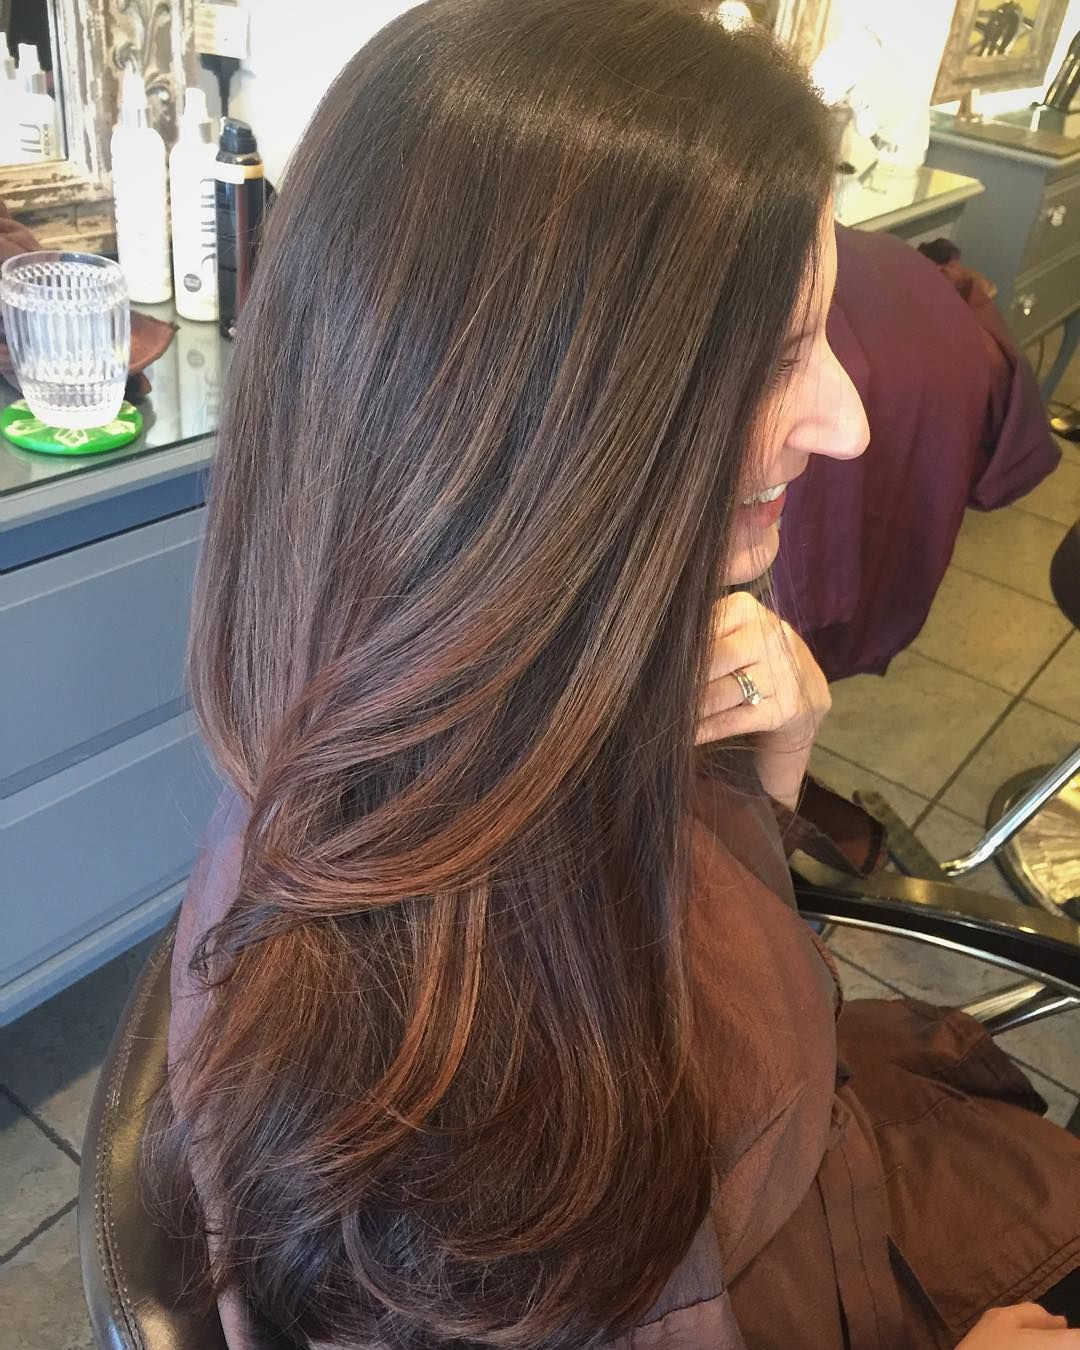 Toni Bish On Instagram Sunkissed Caramel Highligh Brown Hair With Caramel Highlights Caramel Highlights On Dark Hair Brown Hair With Caramel Highlights Light